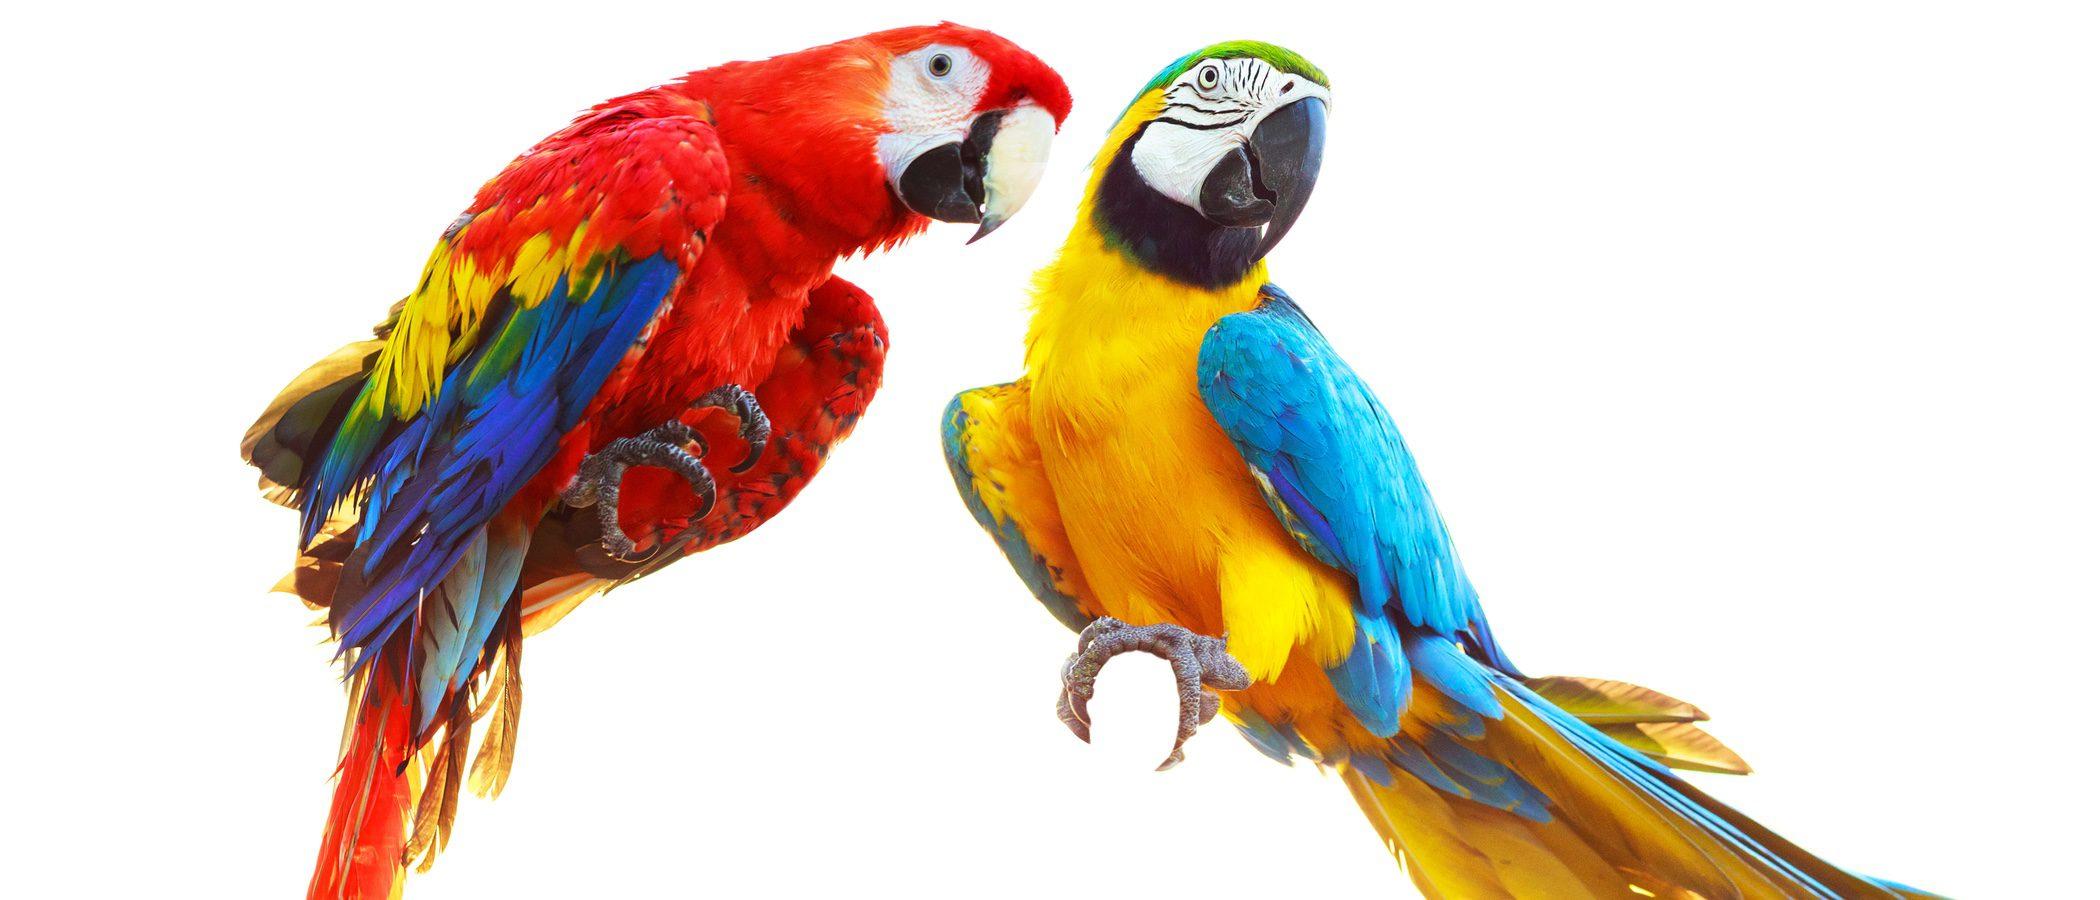 Cacatúa: un ave exótica y parlanchina